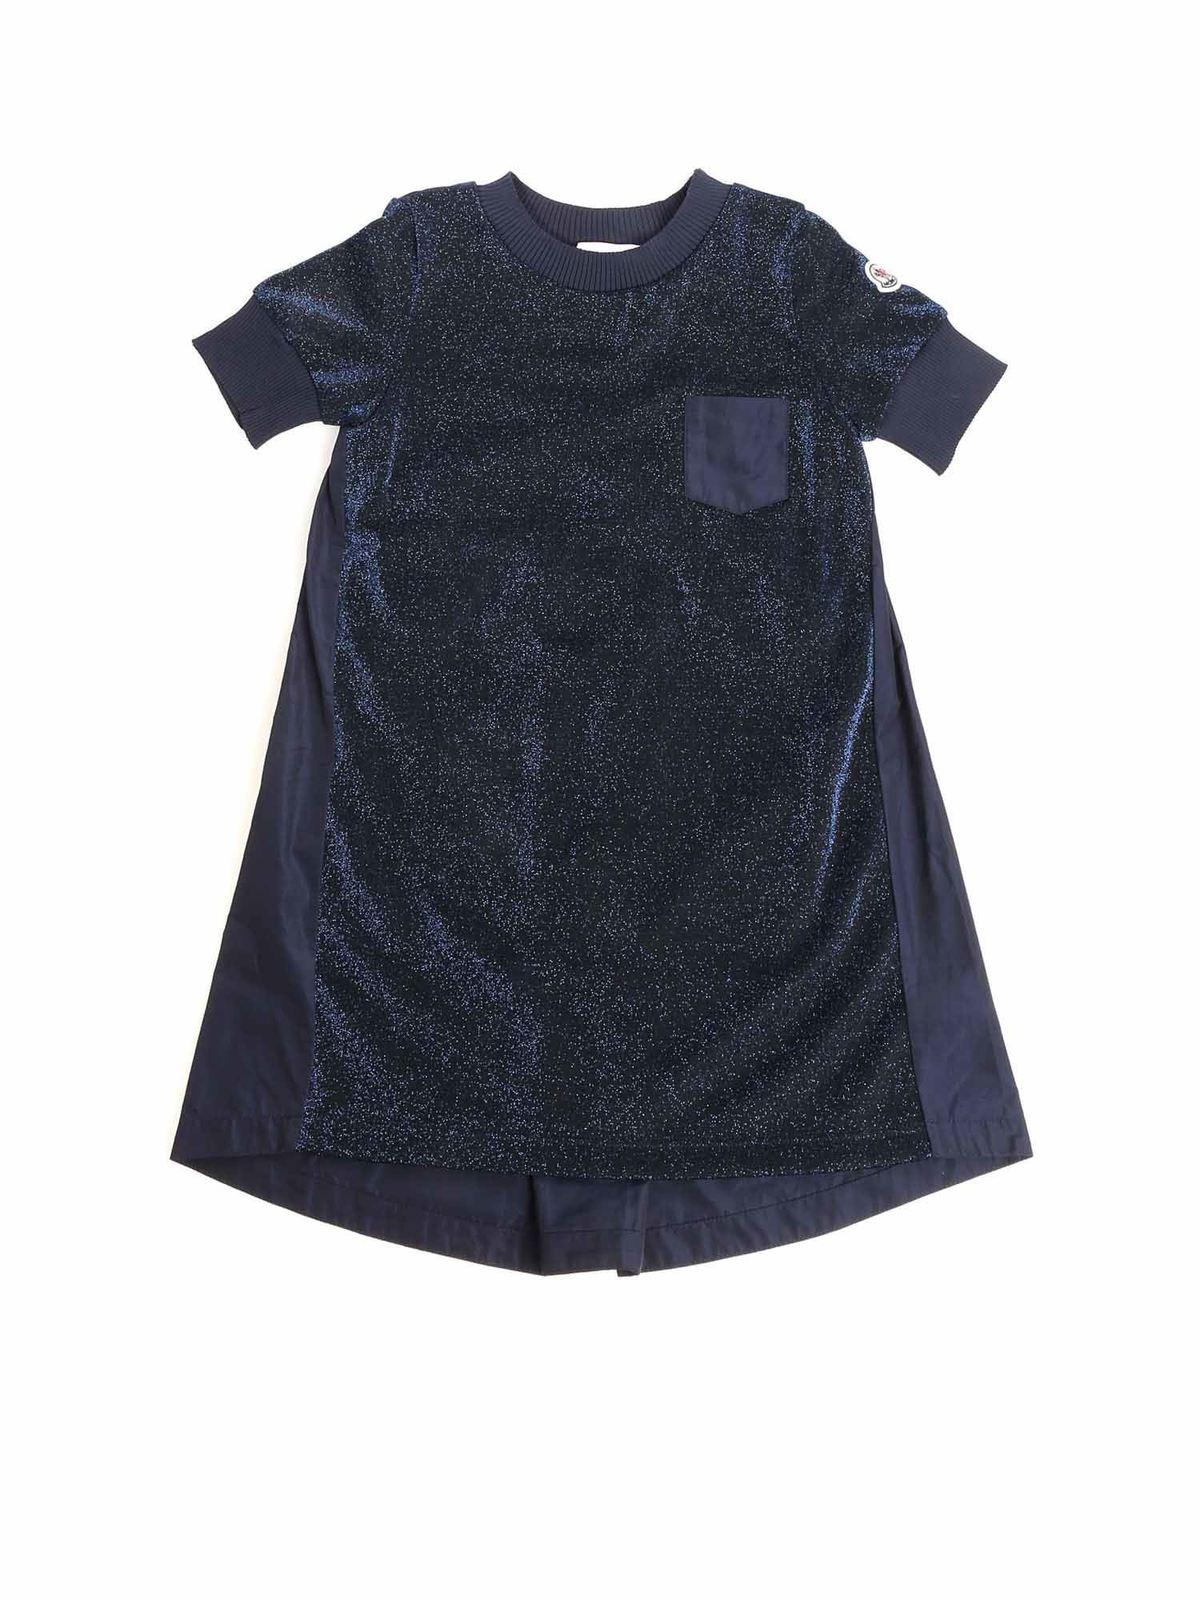 Moncler Jr Cottons BLUE DRESS WITH LOGO DETAIL